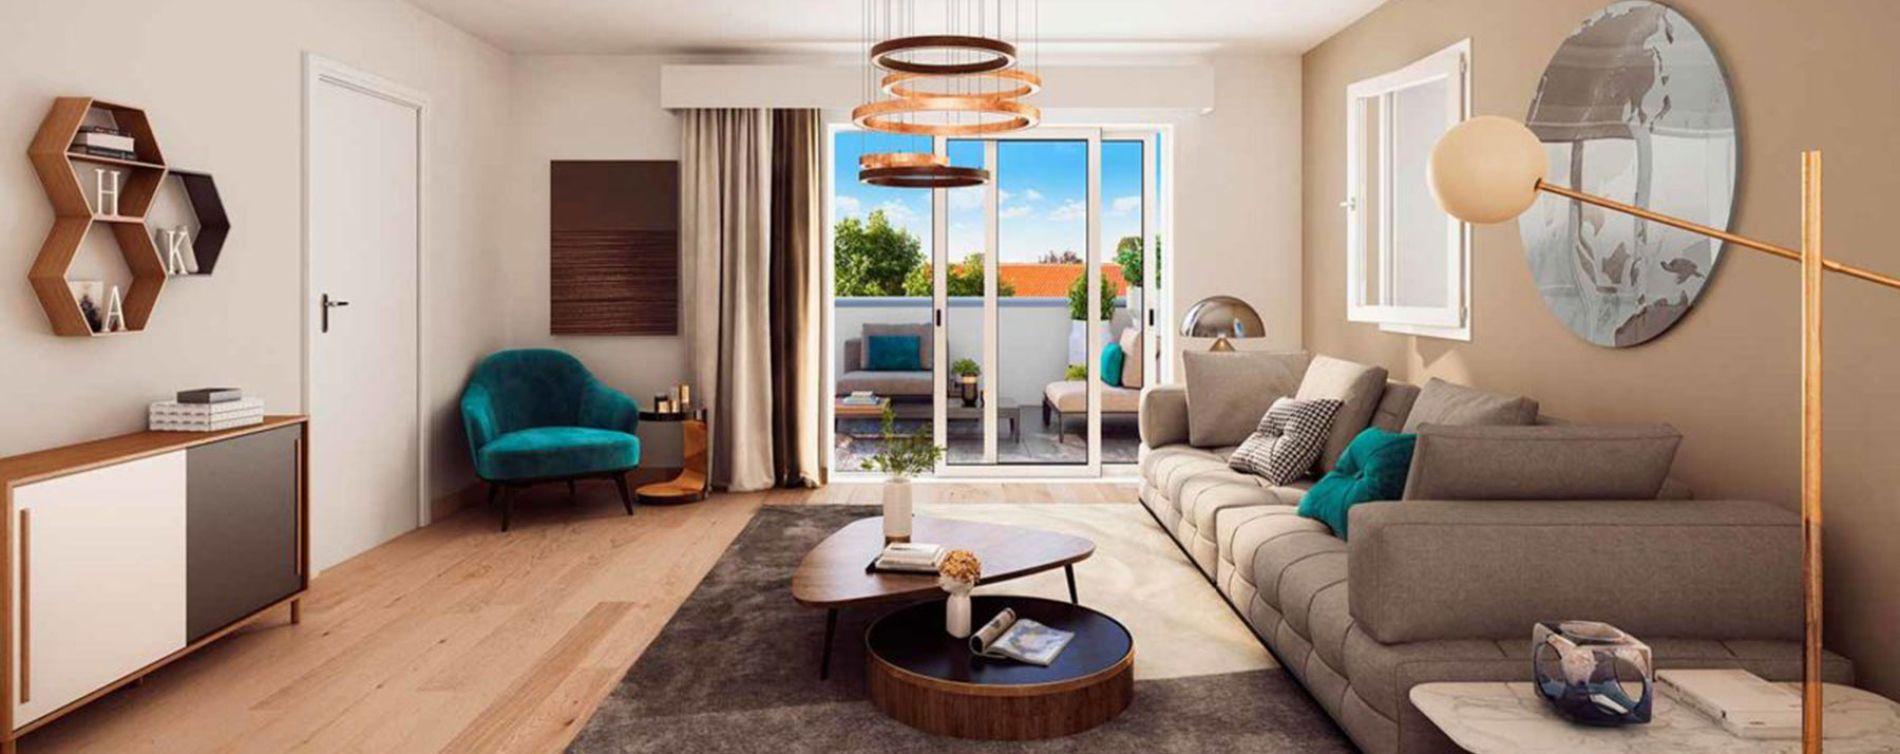 Soorts-Hossegor : programme immobilier neuve « Programme immobilier n°219043 » en Loi Pinel (4)